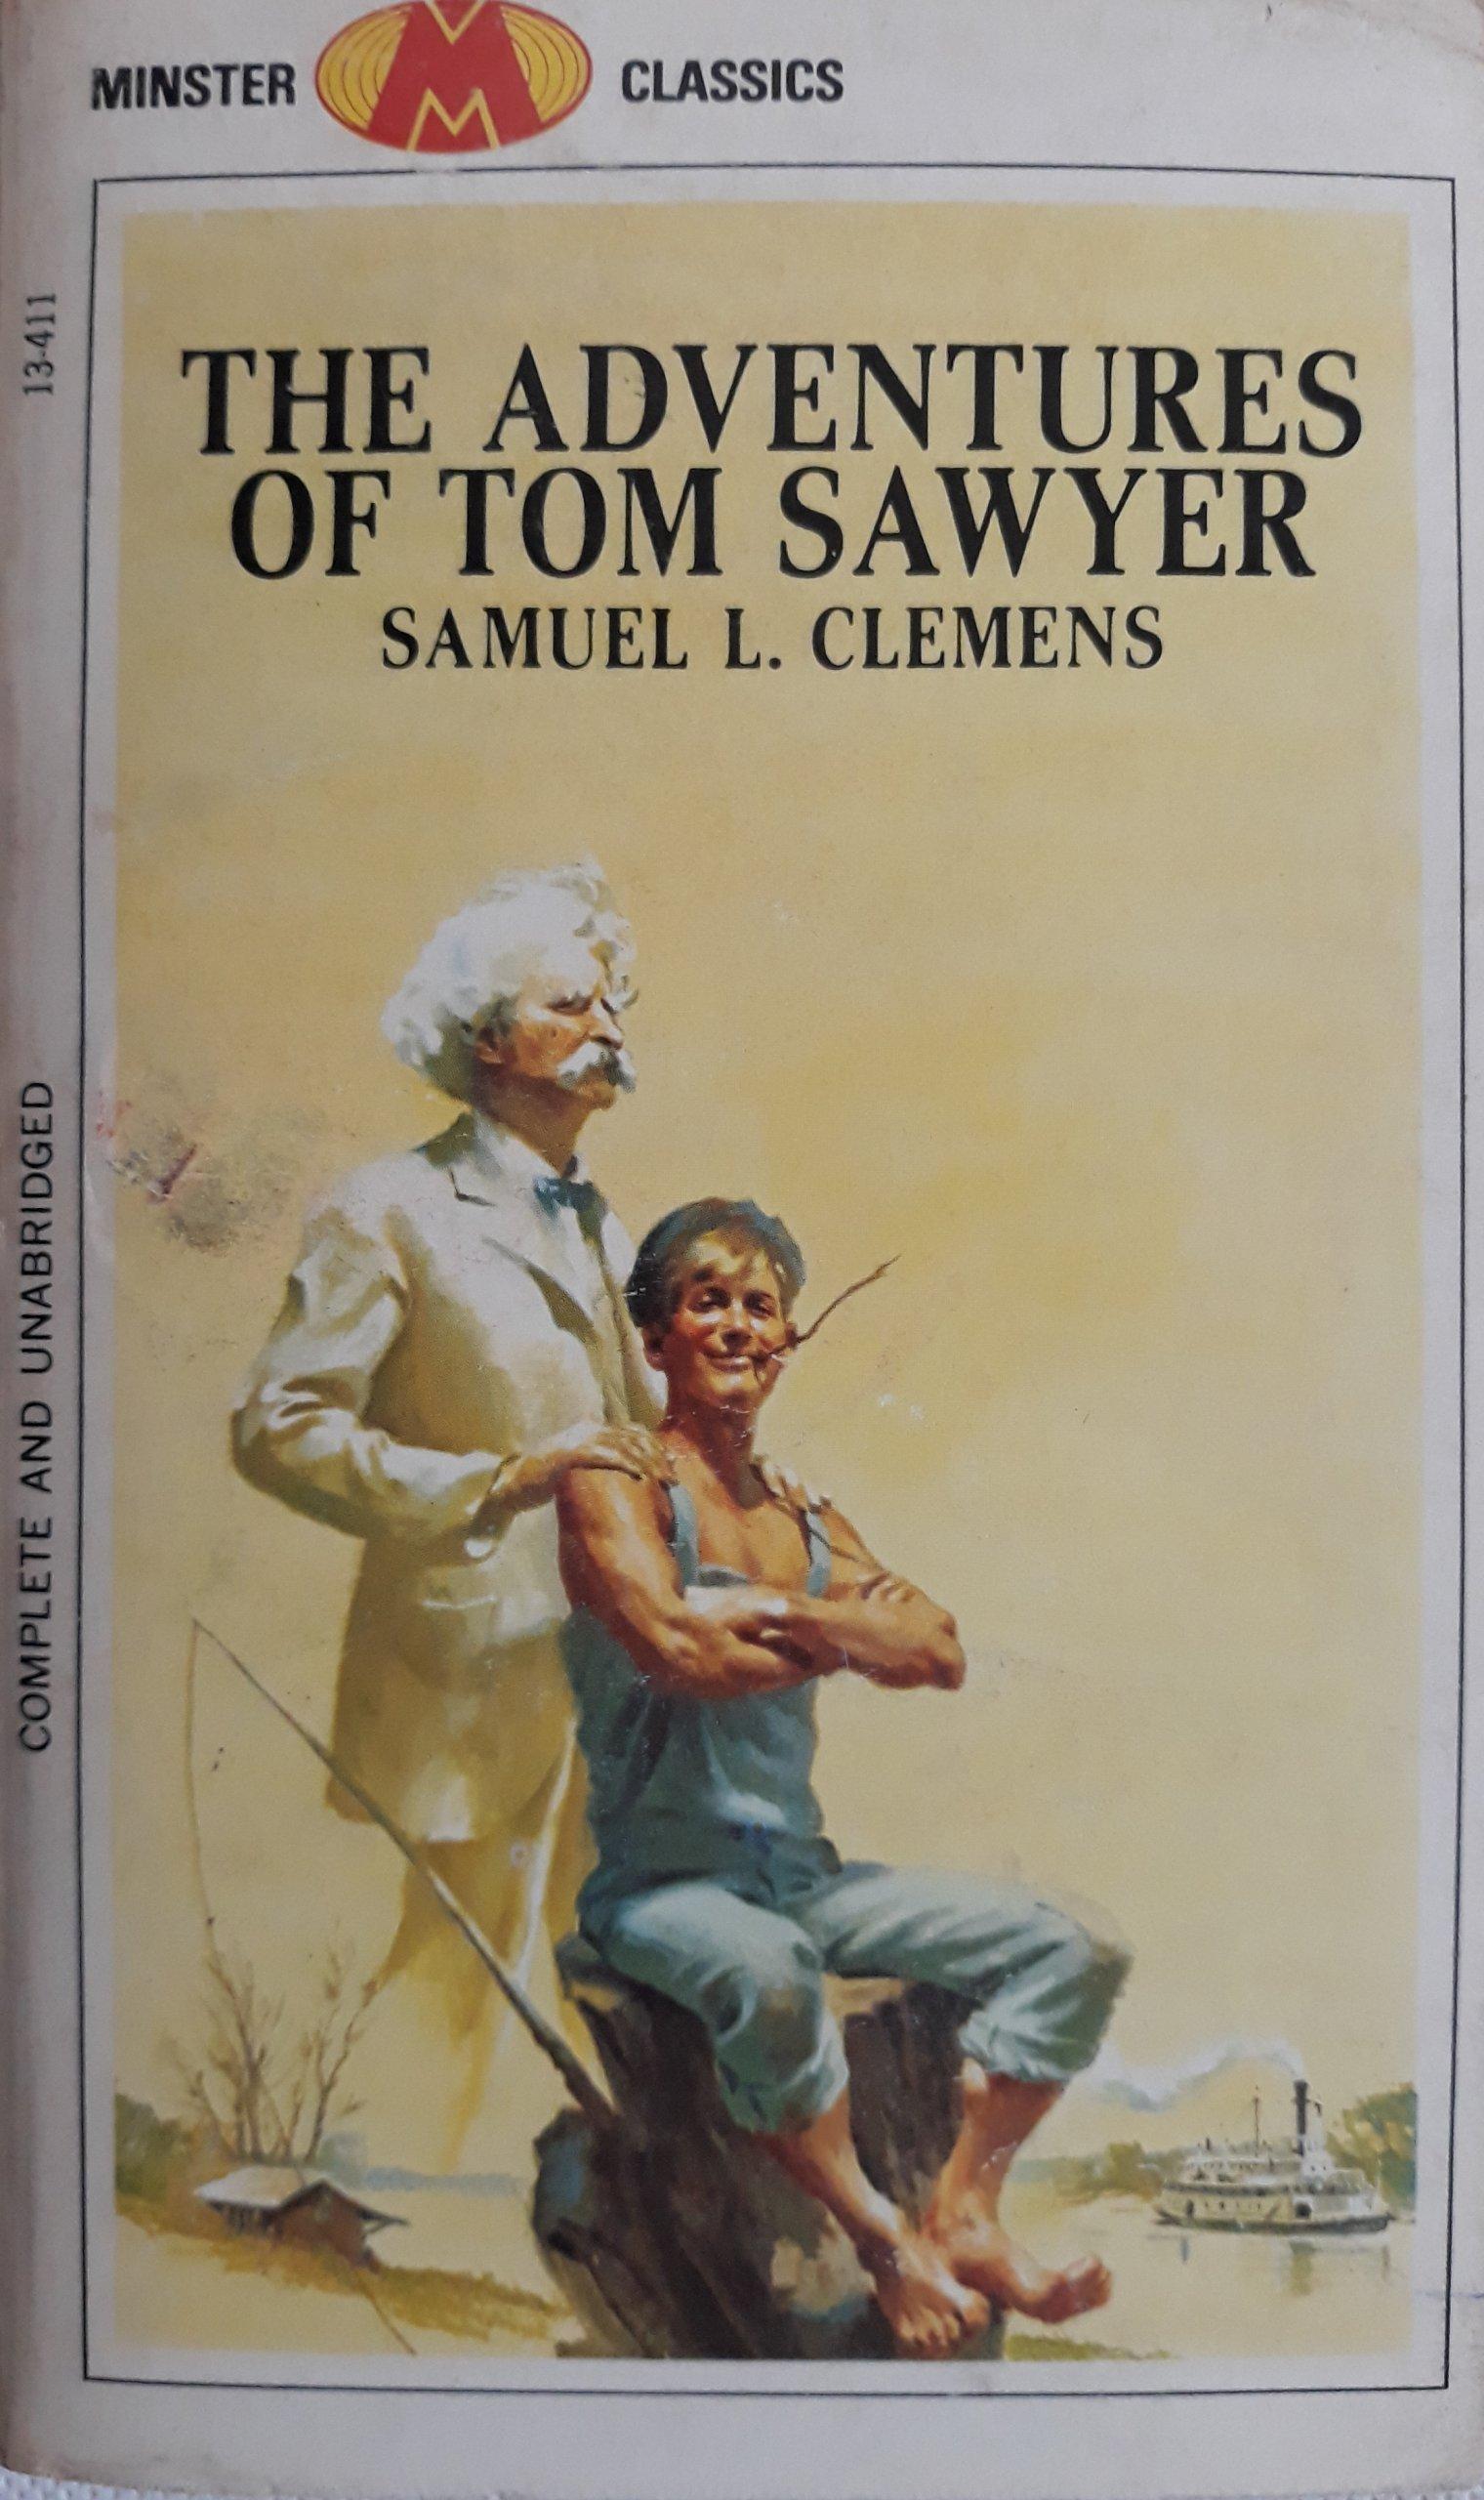 The adventures of Tom Sawyer Samuel Clemens